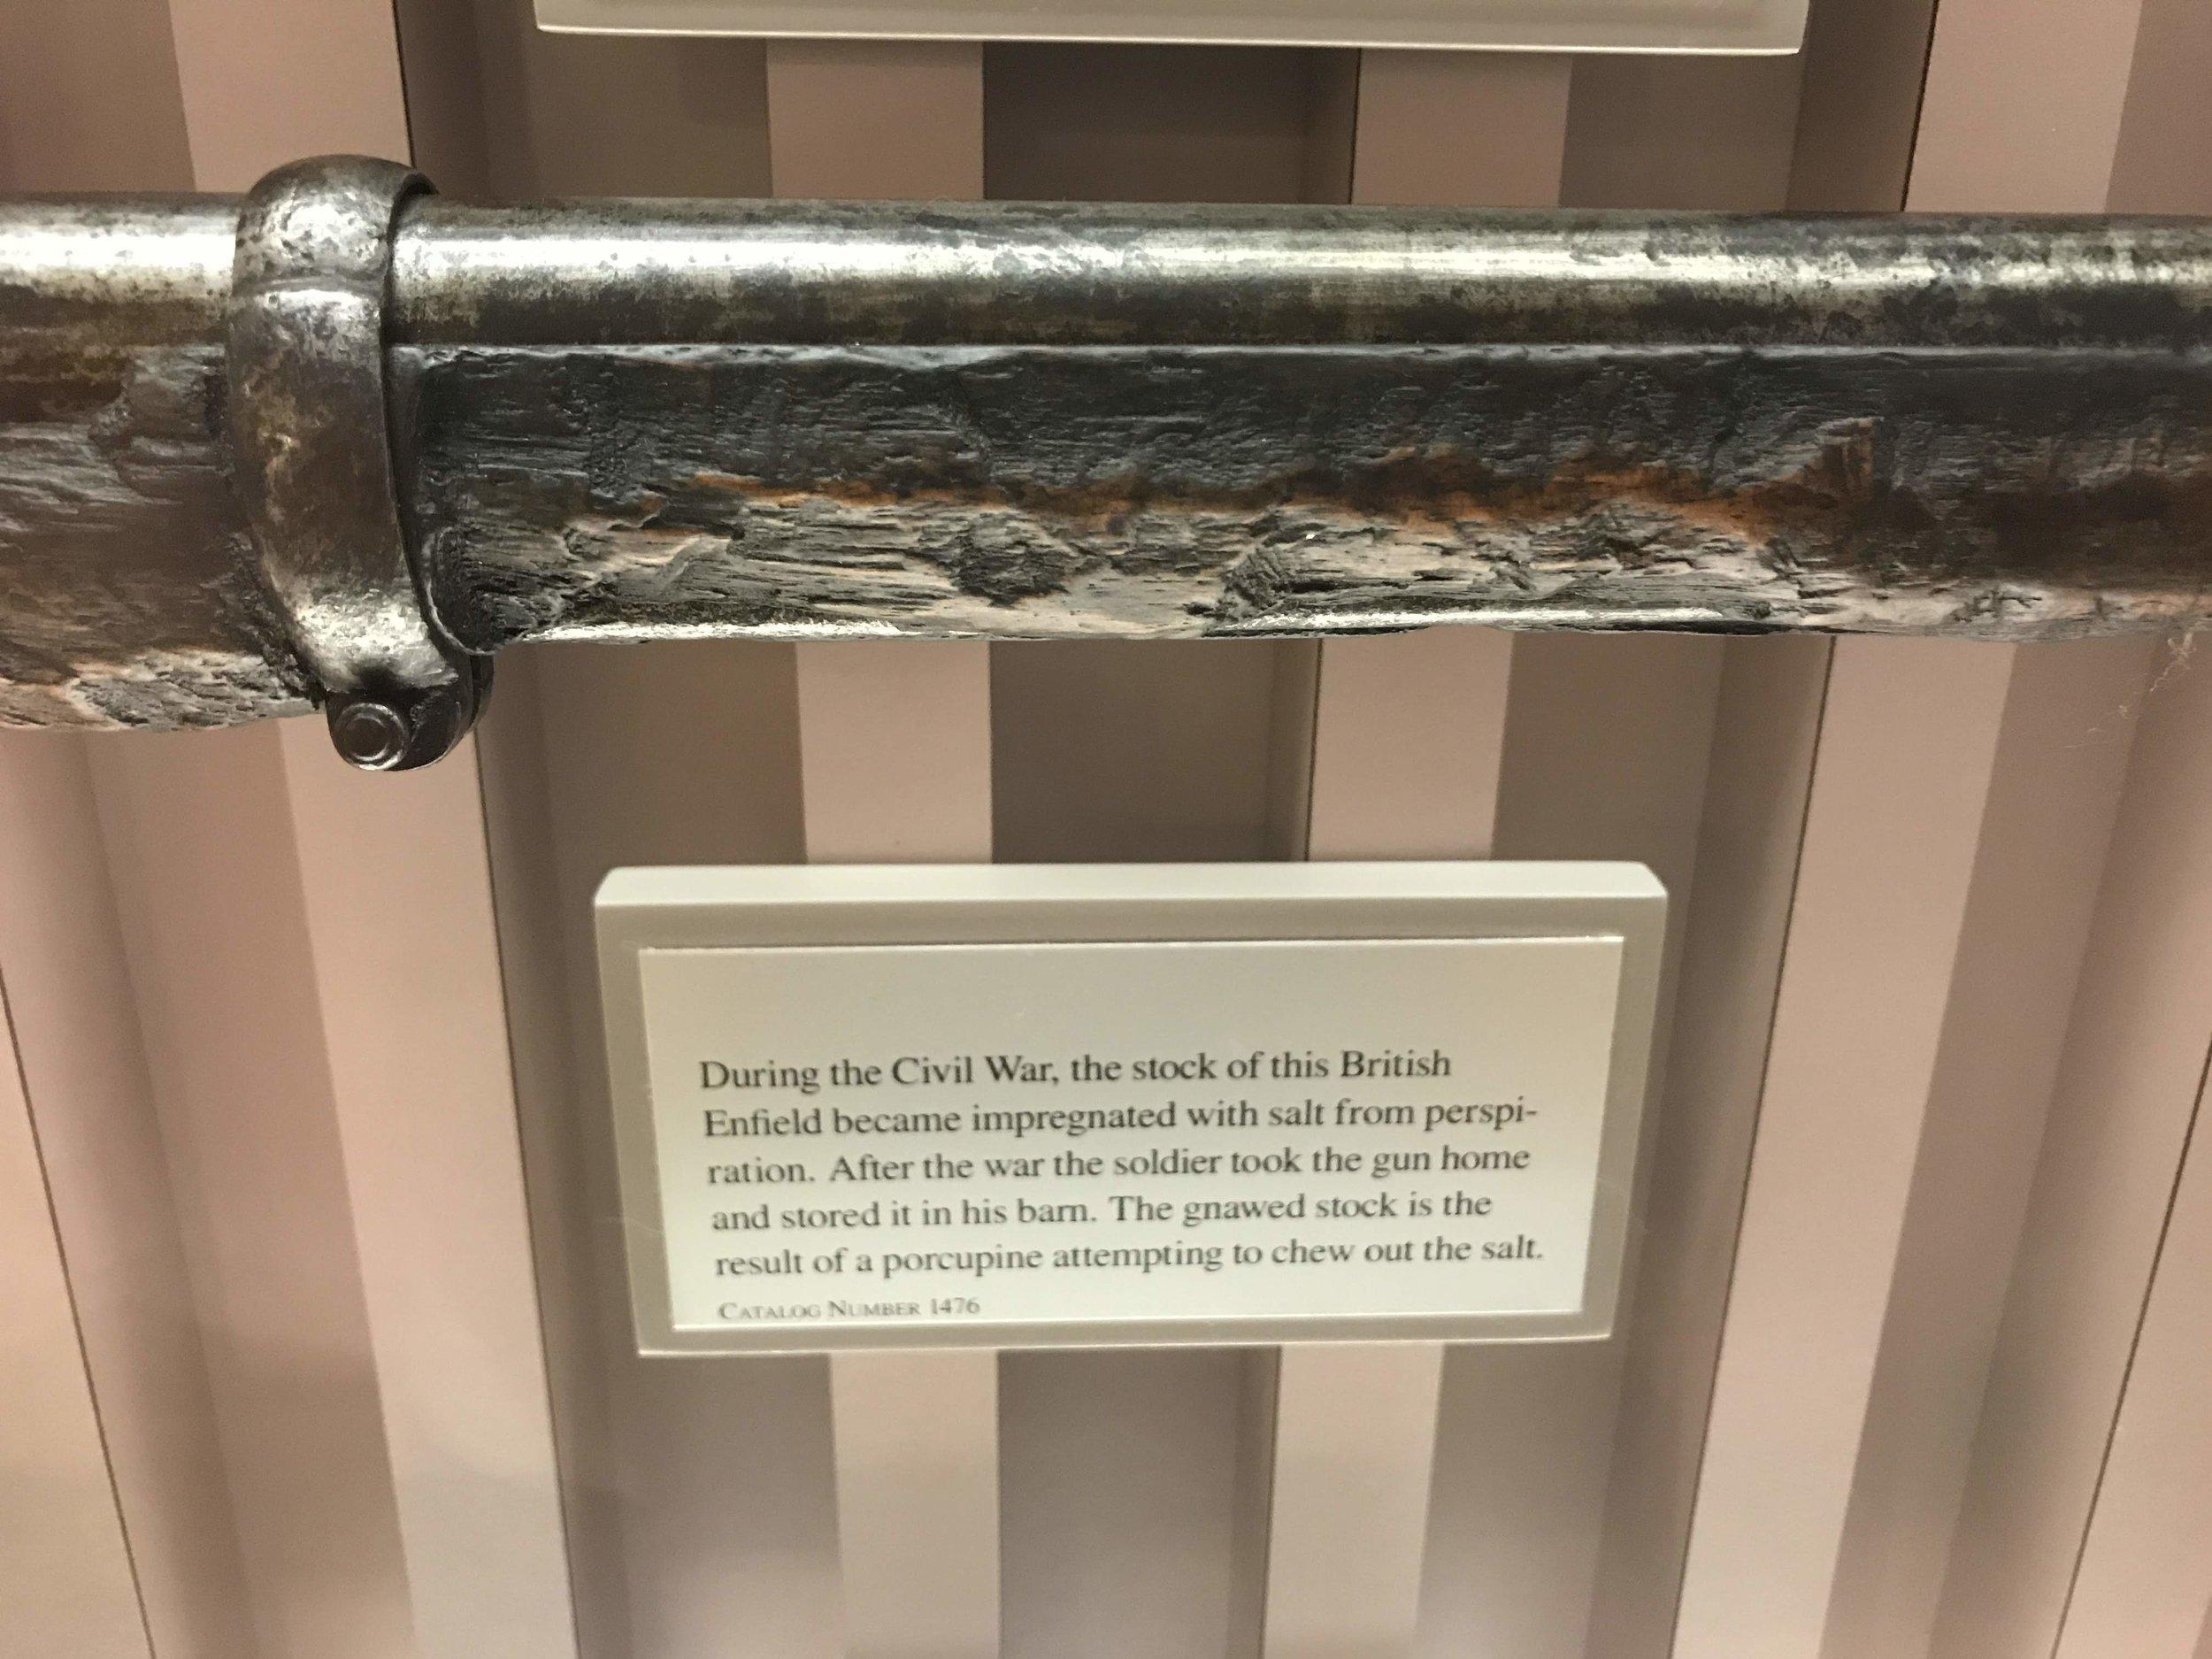 Civil War rifle eaten by a porcupine